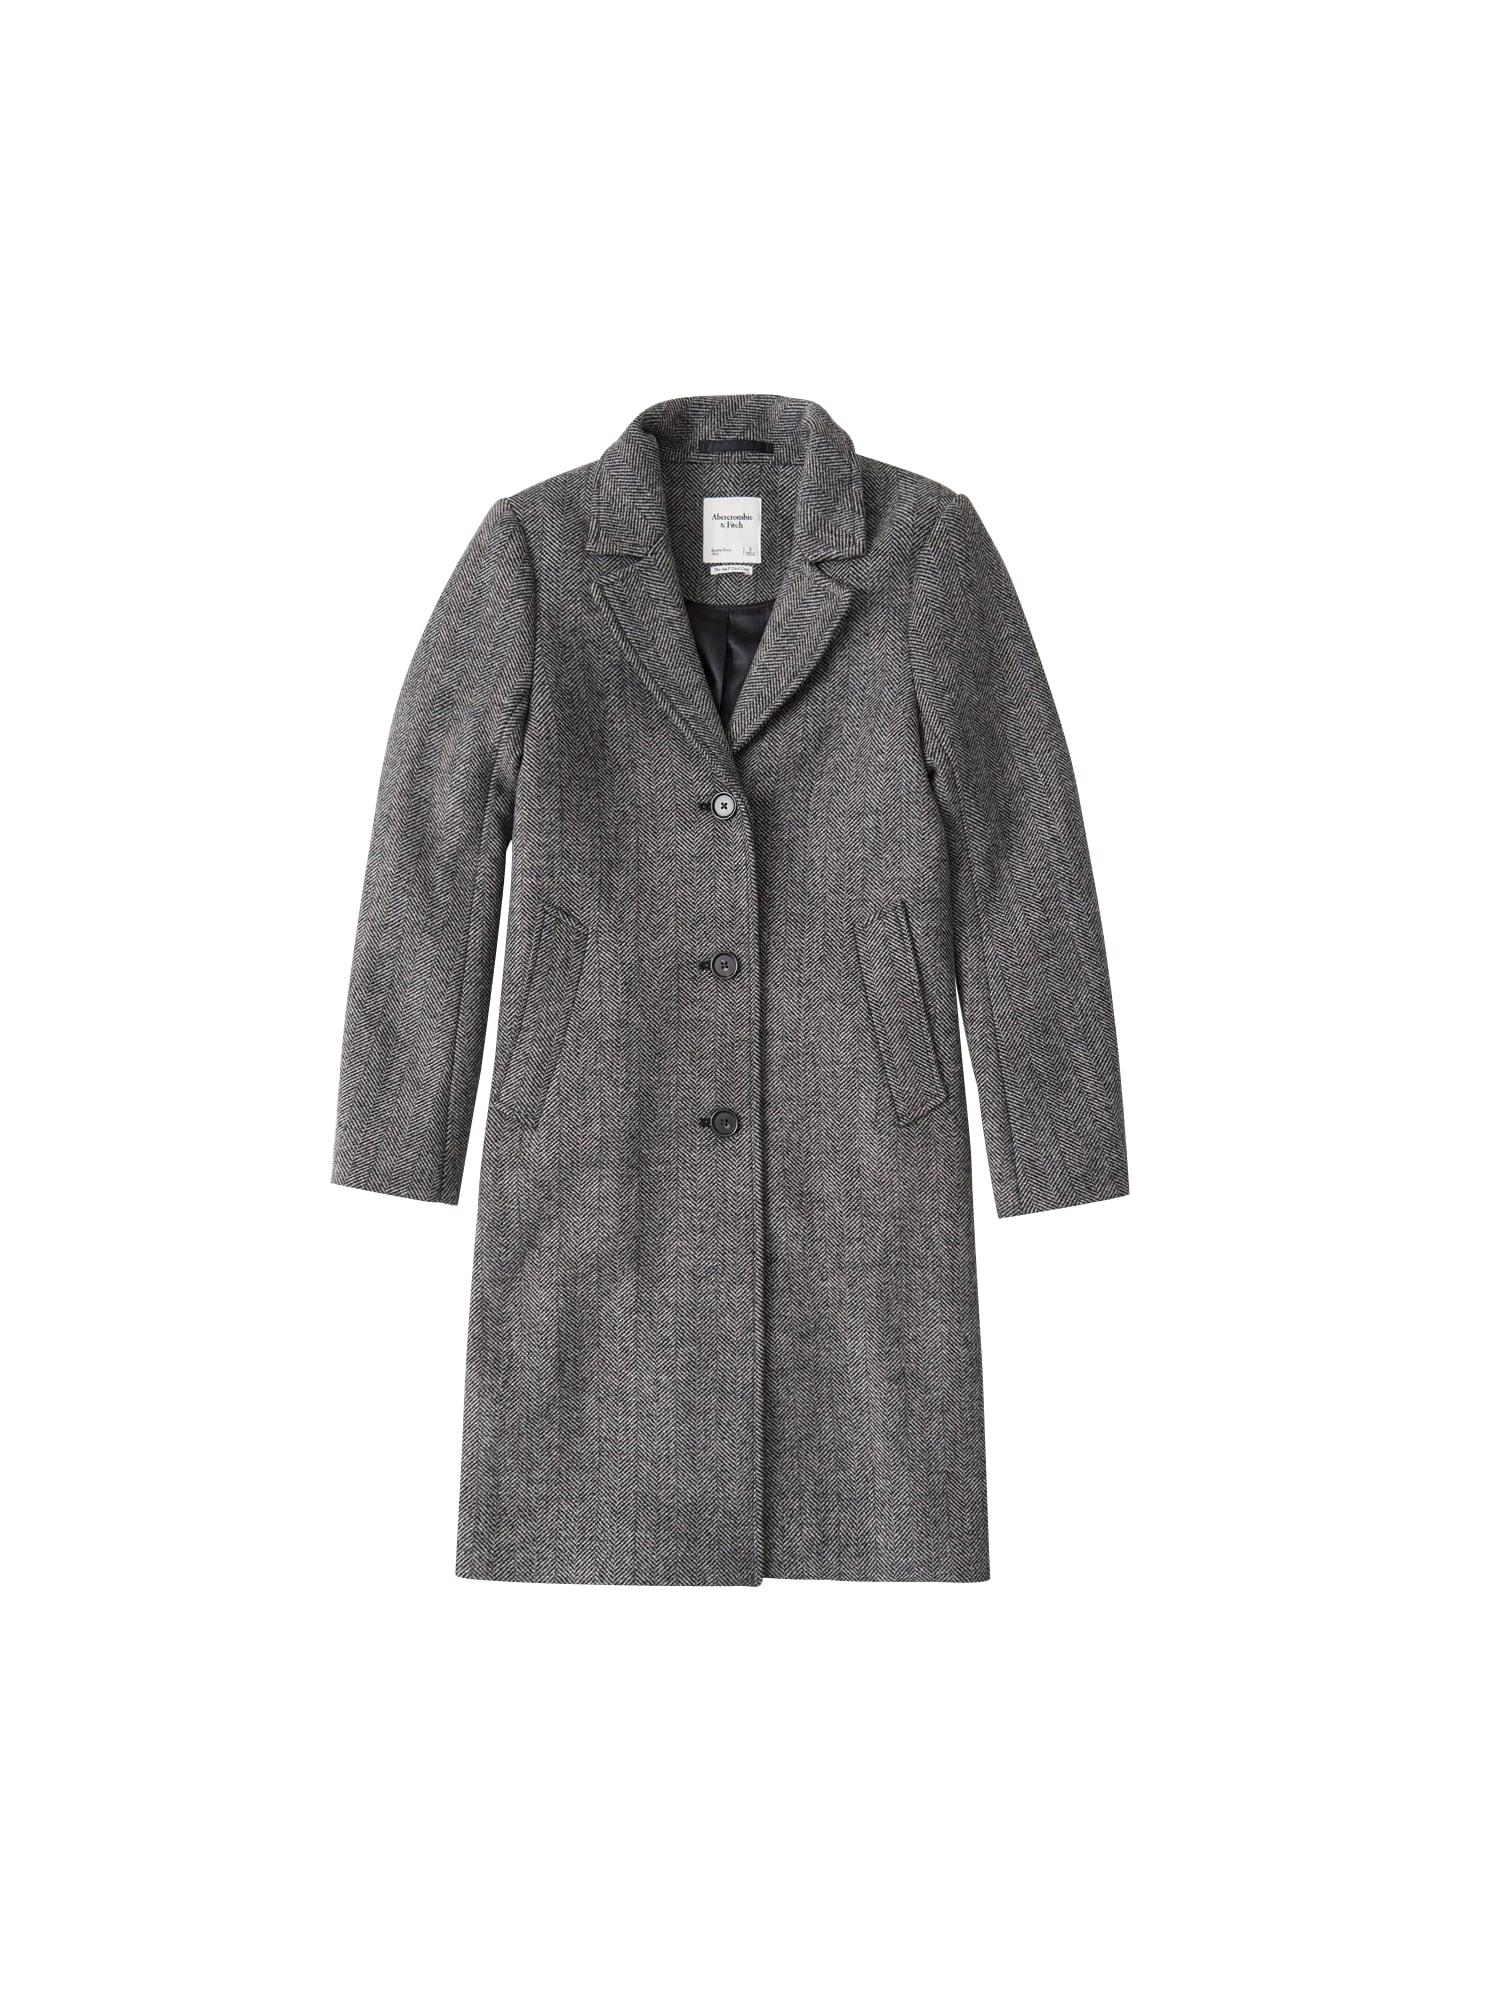 Abercrombie & Fitch Demisezoninis paltas juoda / pilka